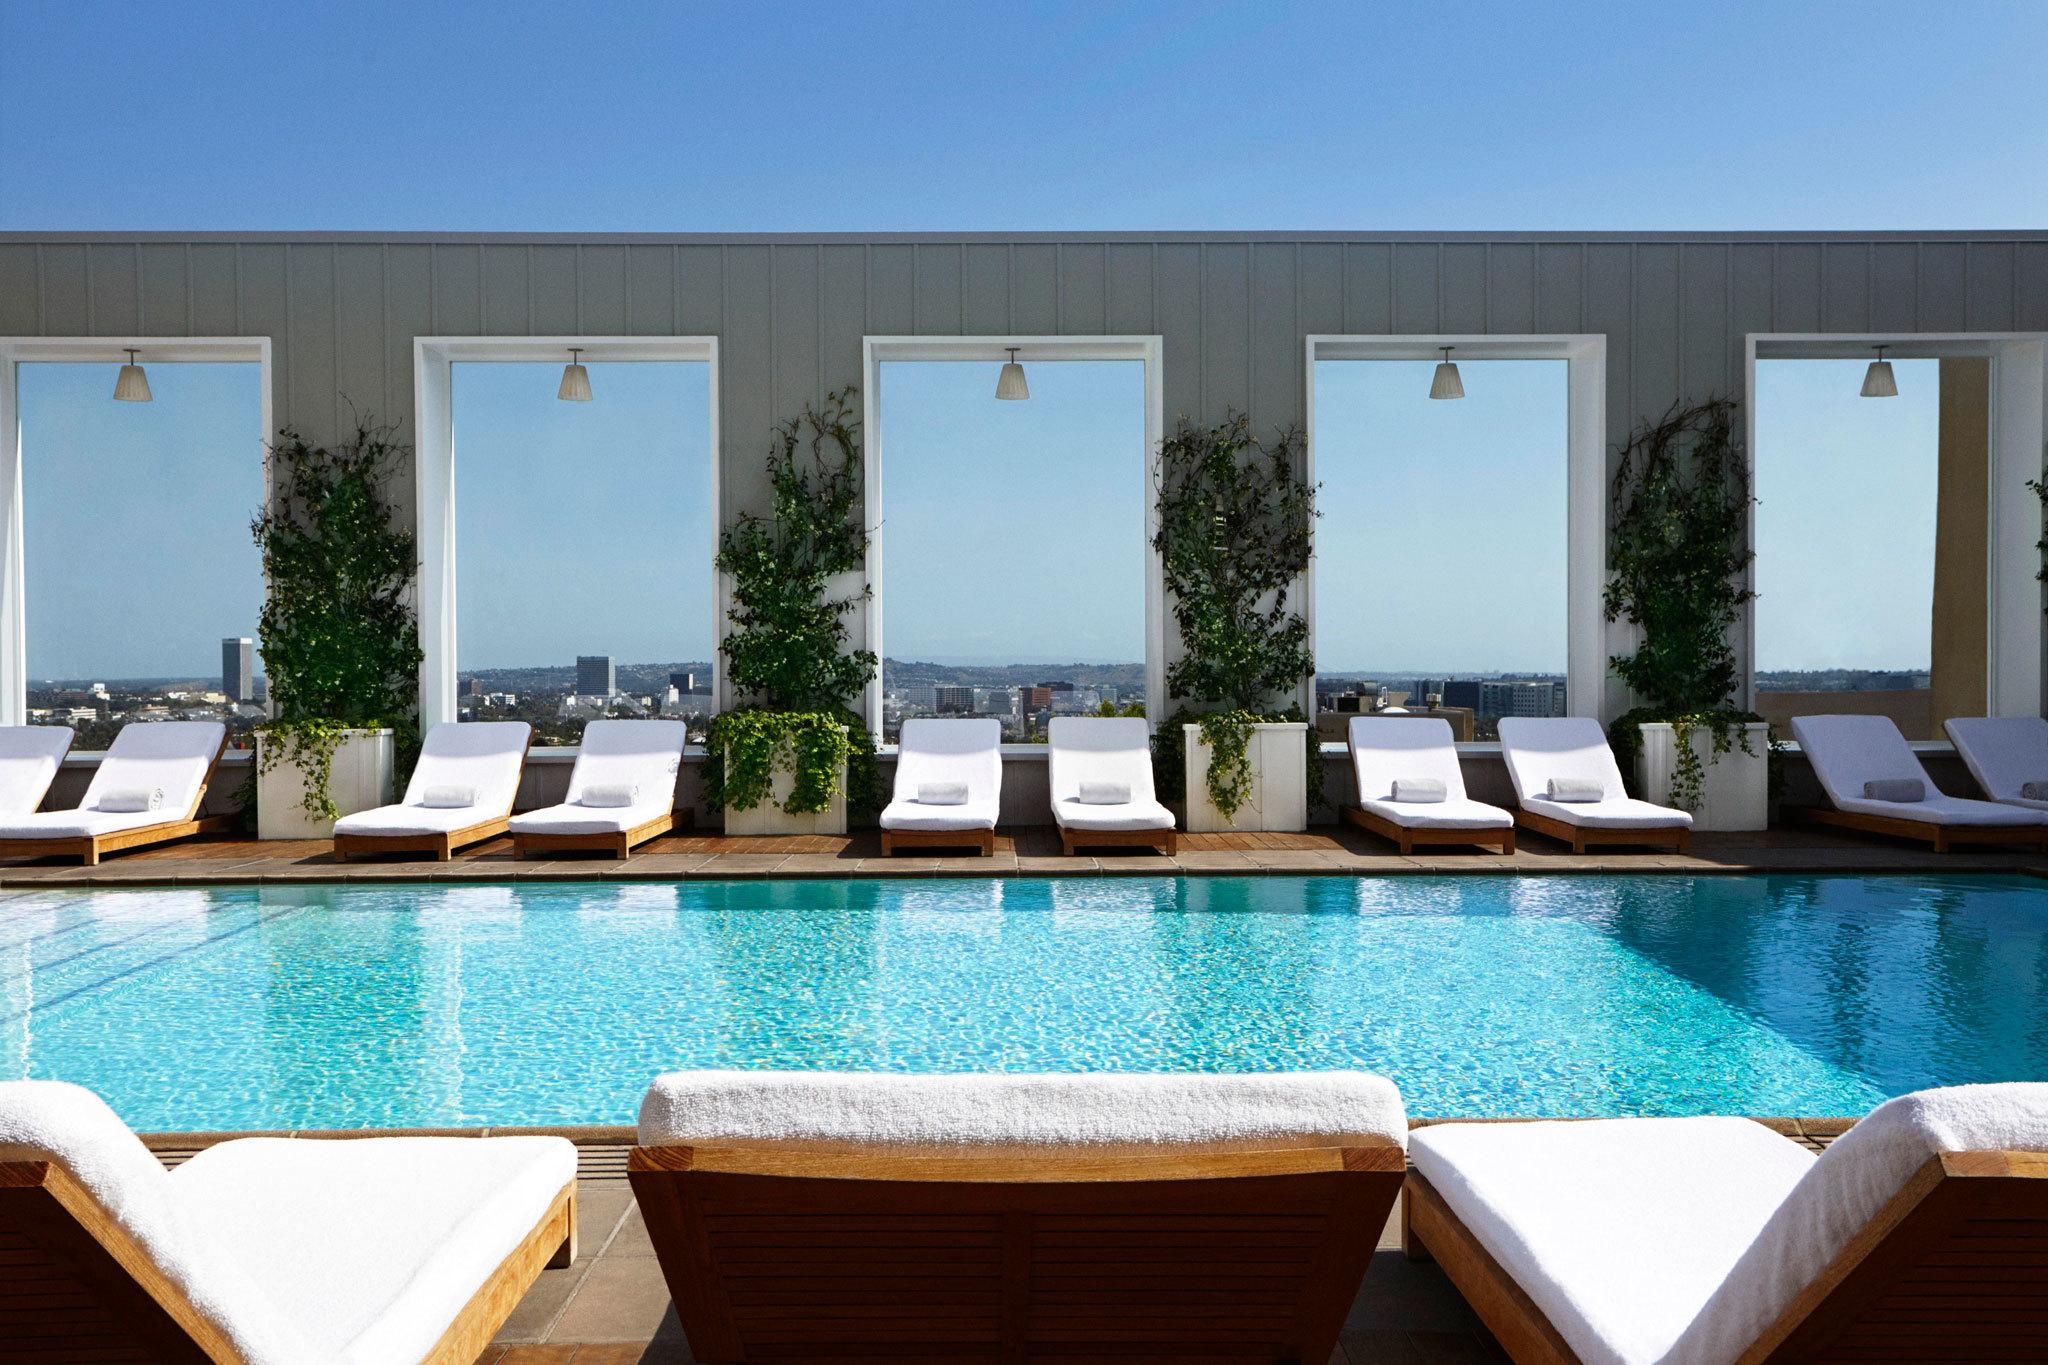 SkybarWest Hollywood Rooftop Bar